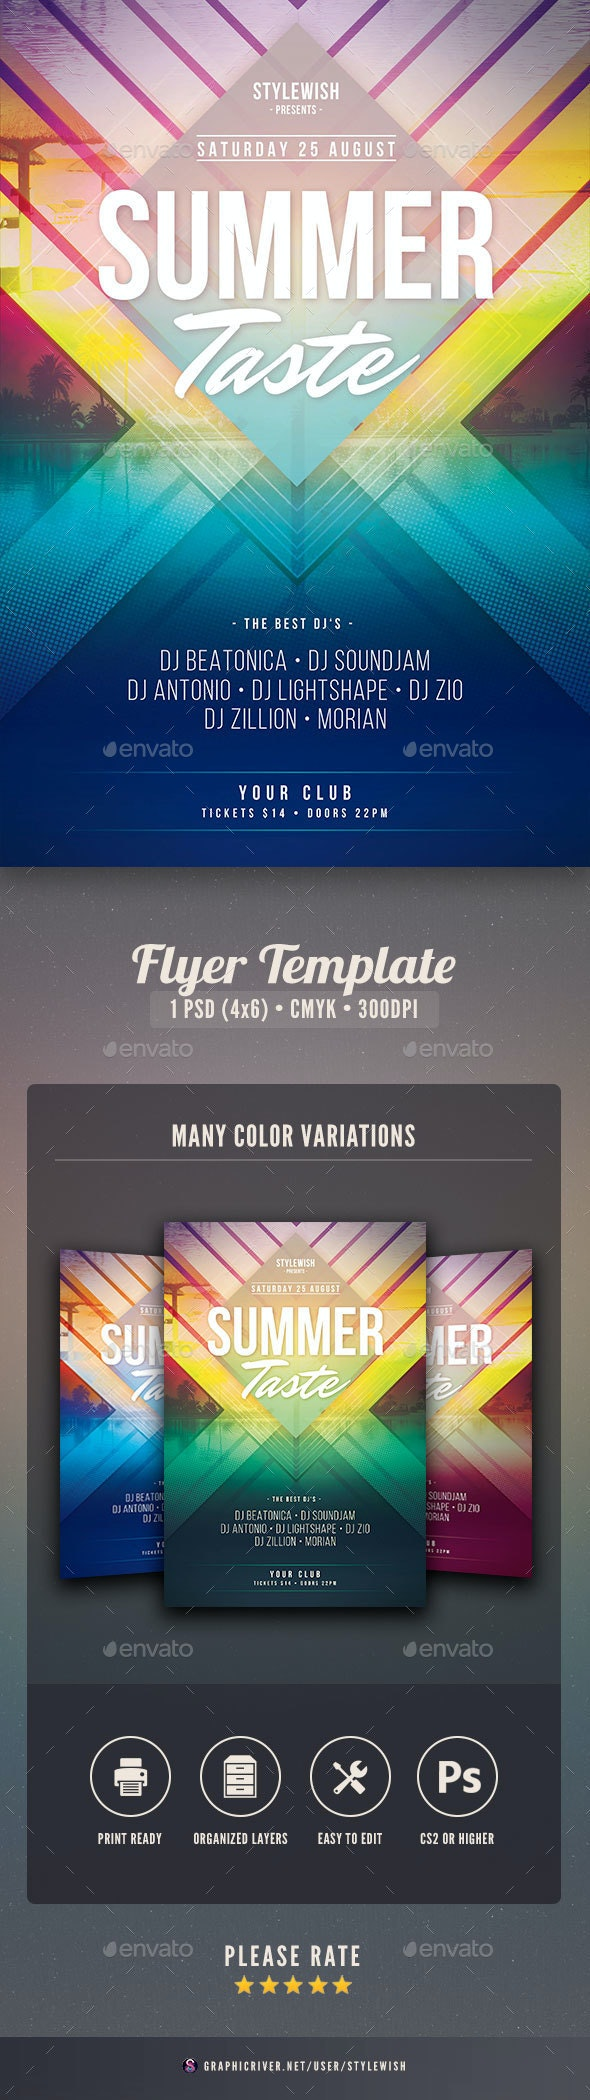 Summer Taste Flyer - Clubs & Parties Events